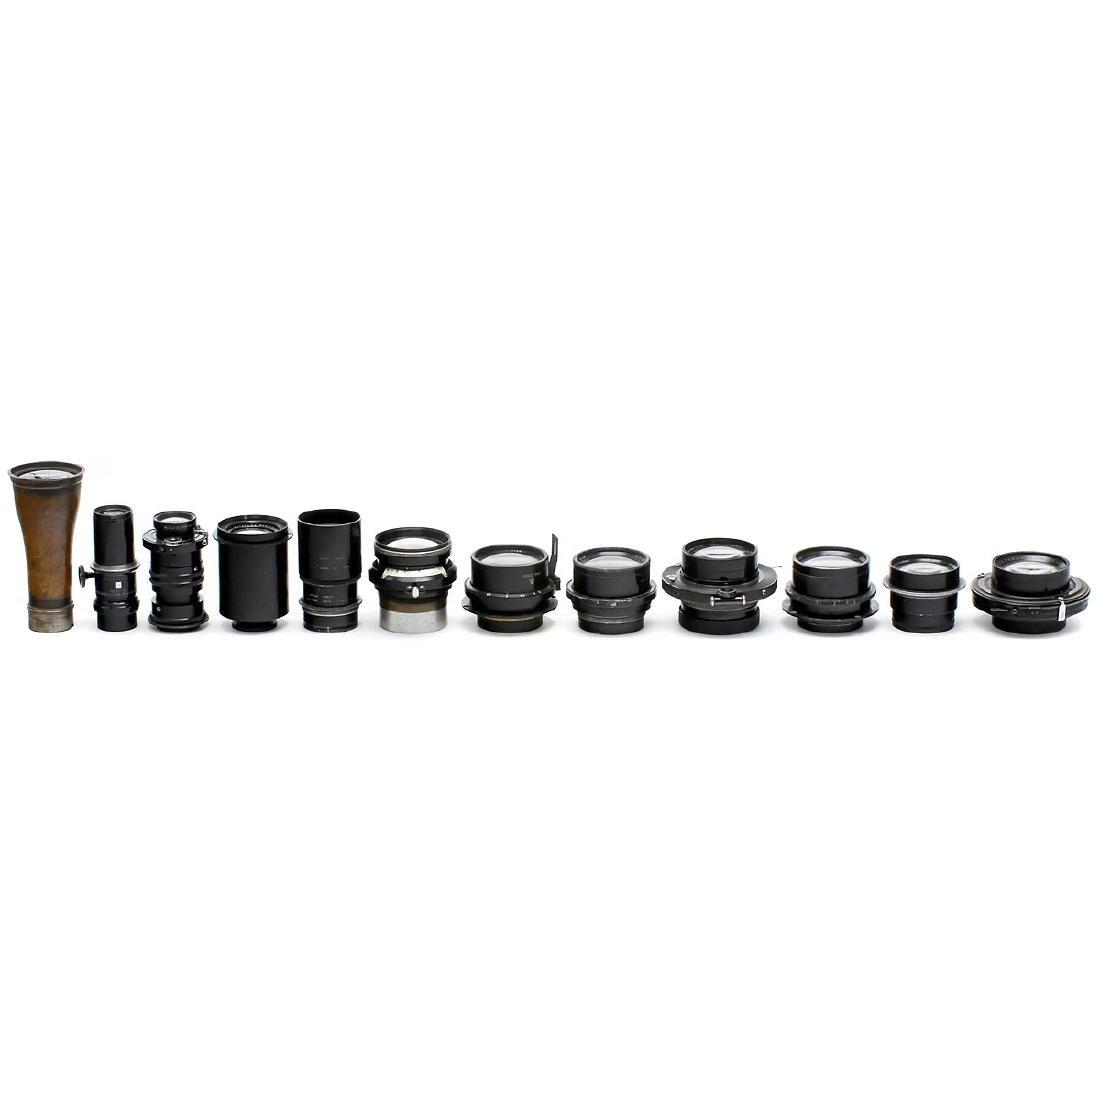 20 Lenses (Various Manufacturers) - 2